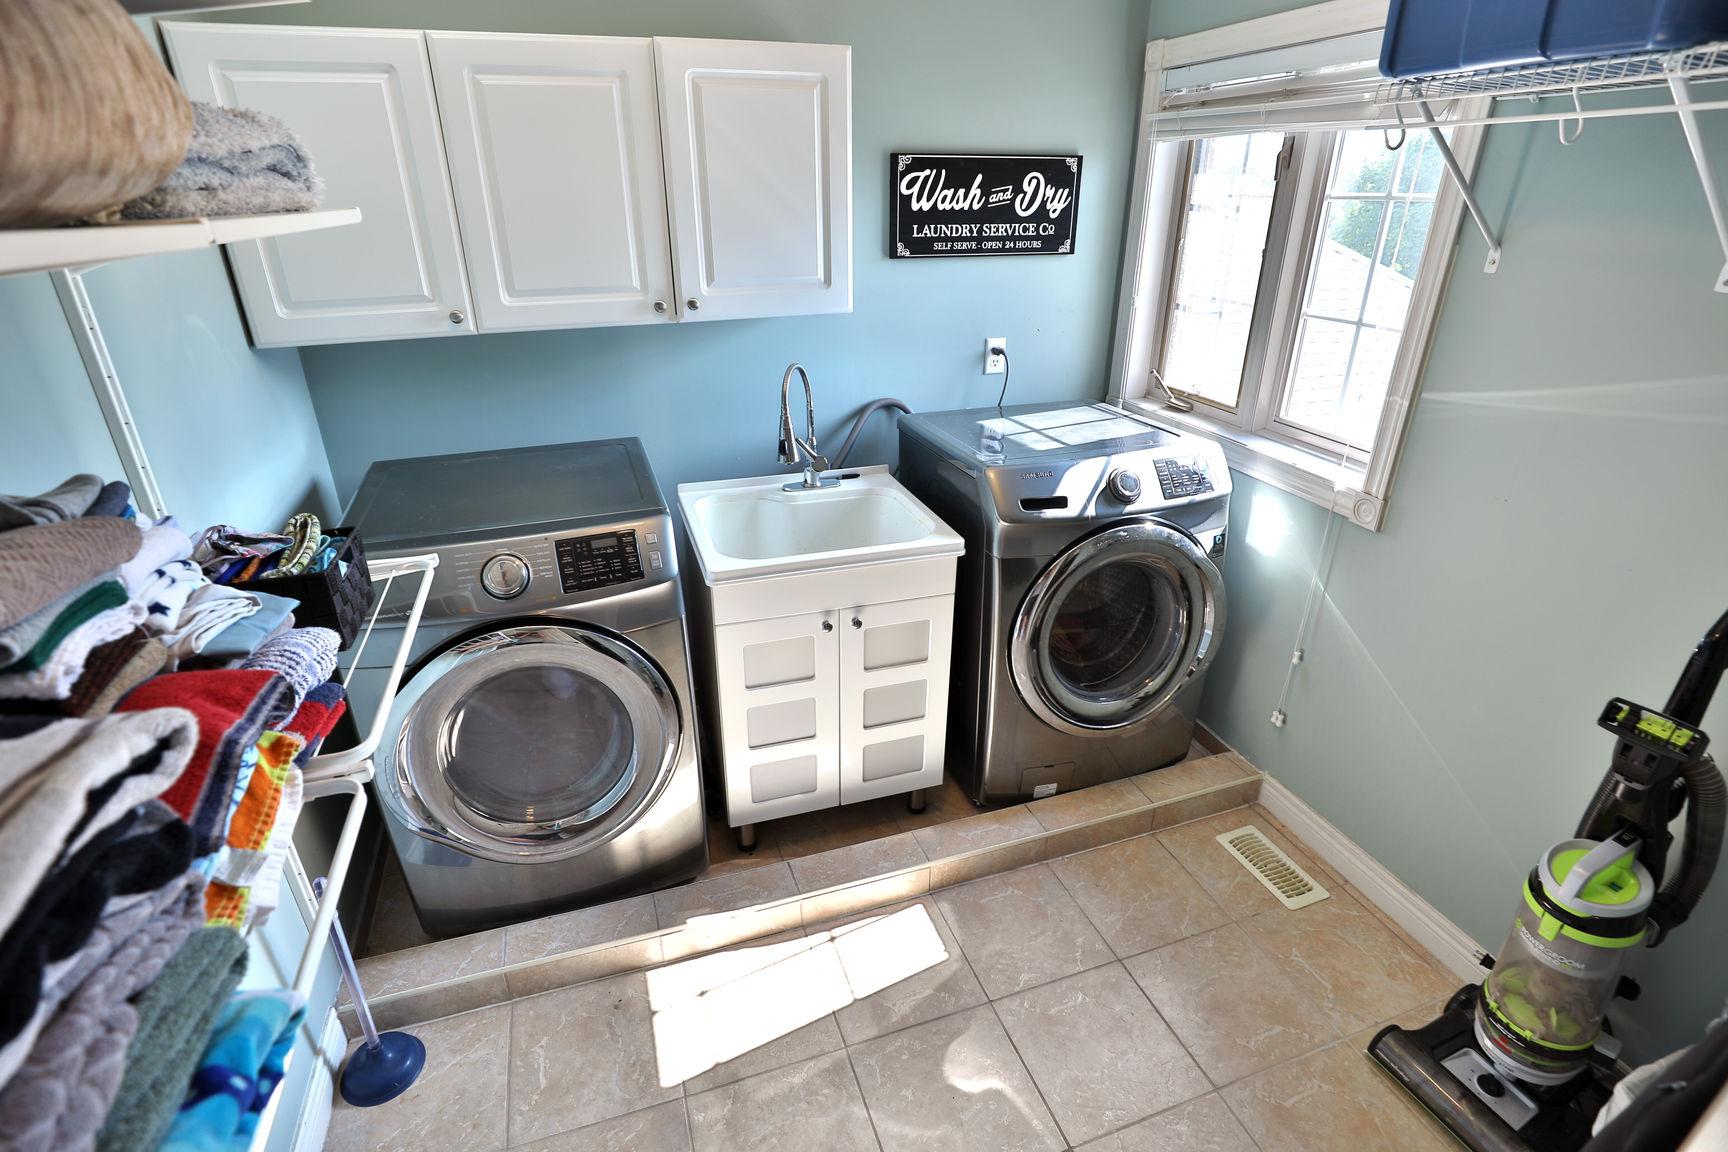 Glanbrook Binbrook 26 Switzer laundry 3 - Recently SOLD in Binbrook